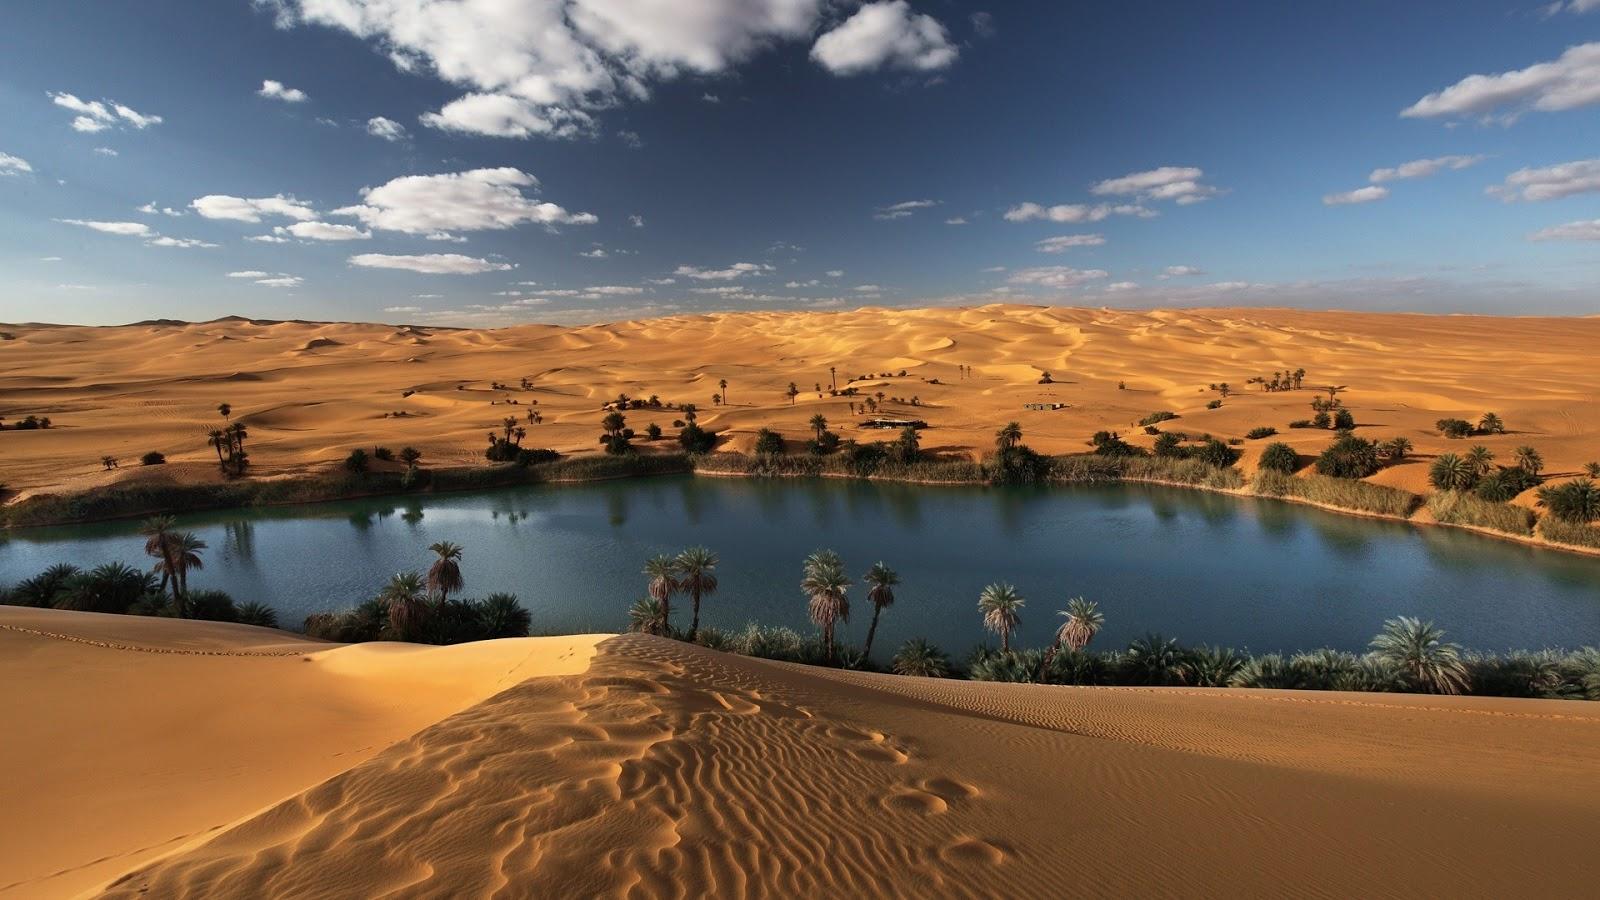 Mystery Wallpaper Oasis in the Libyan Desert 1600x900